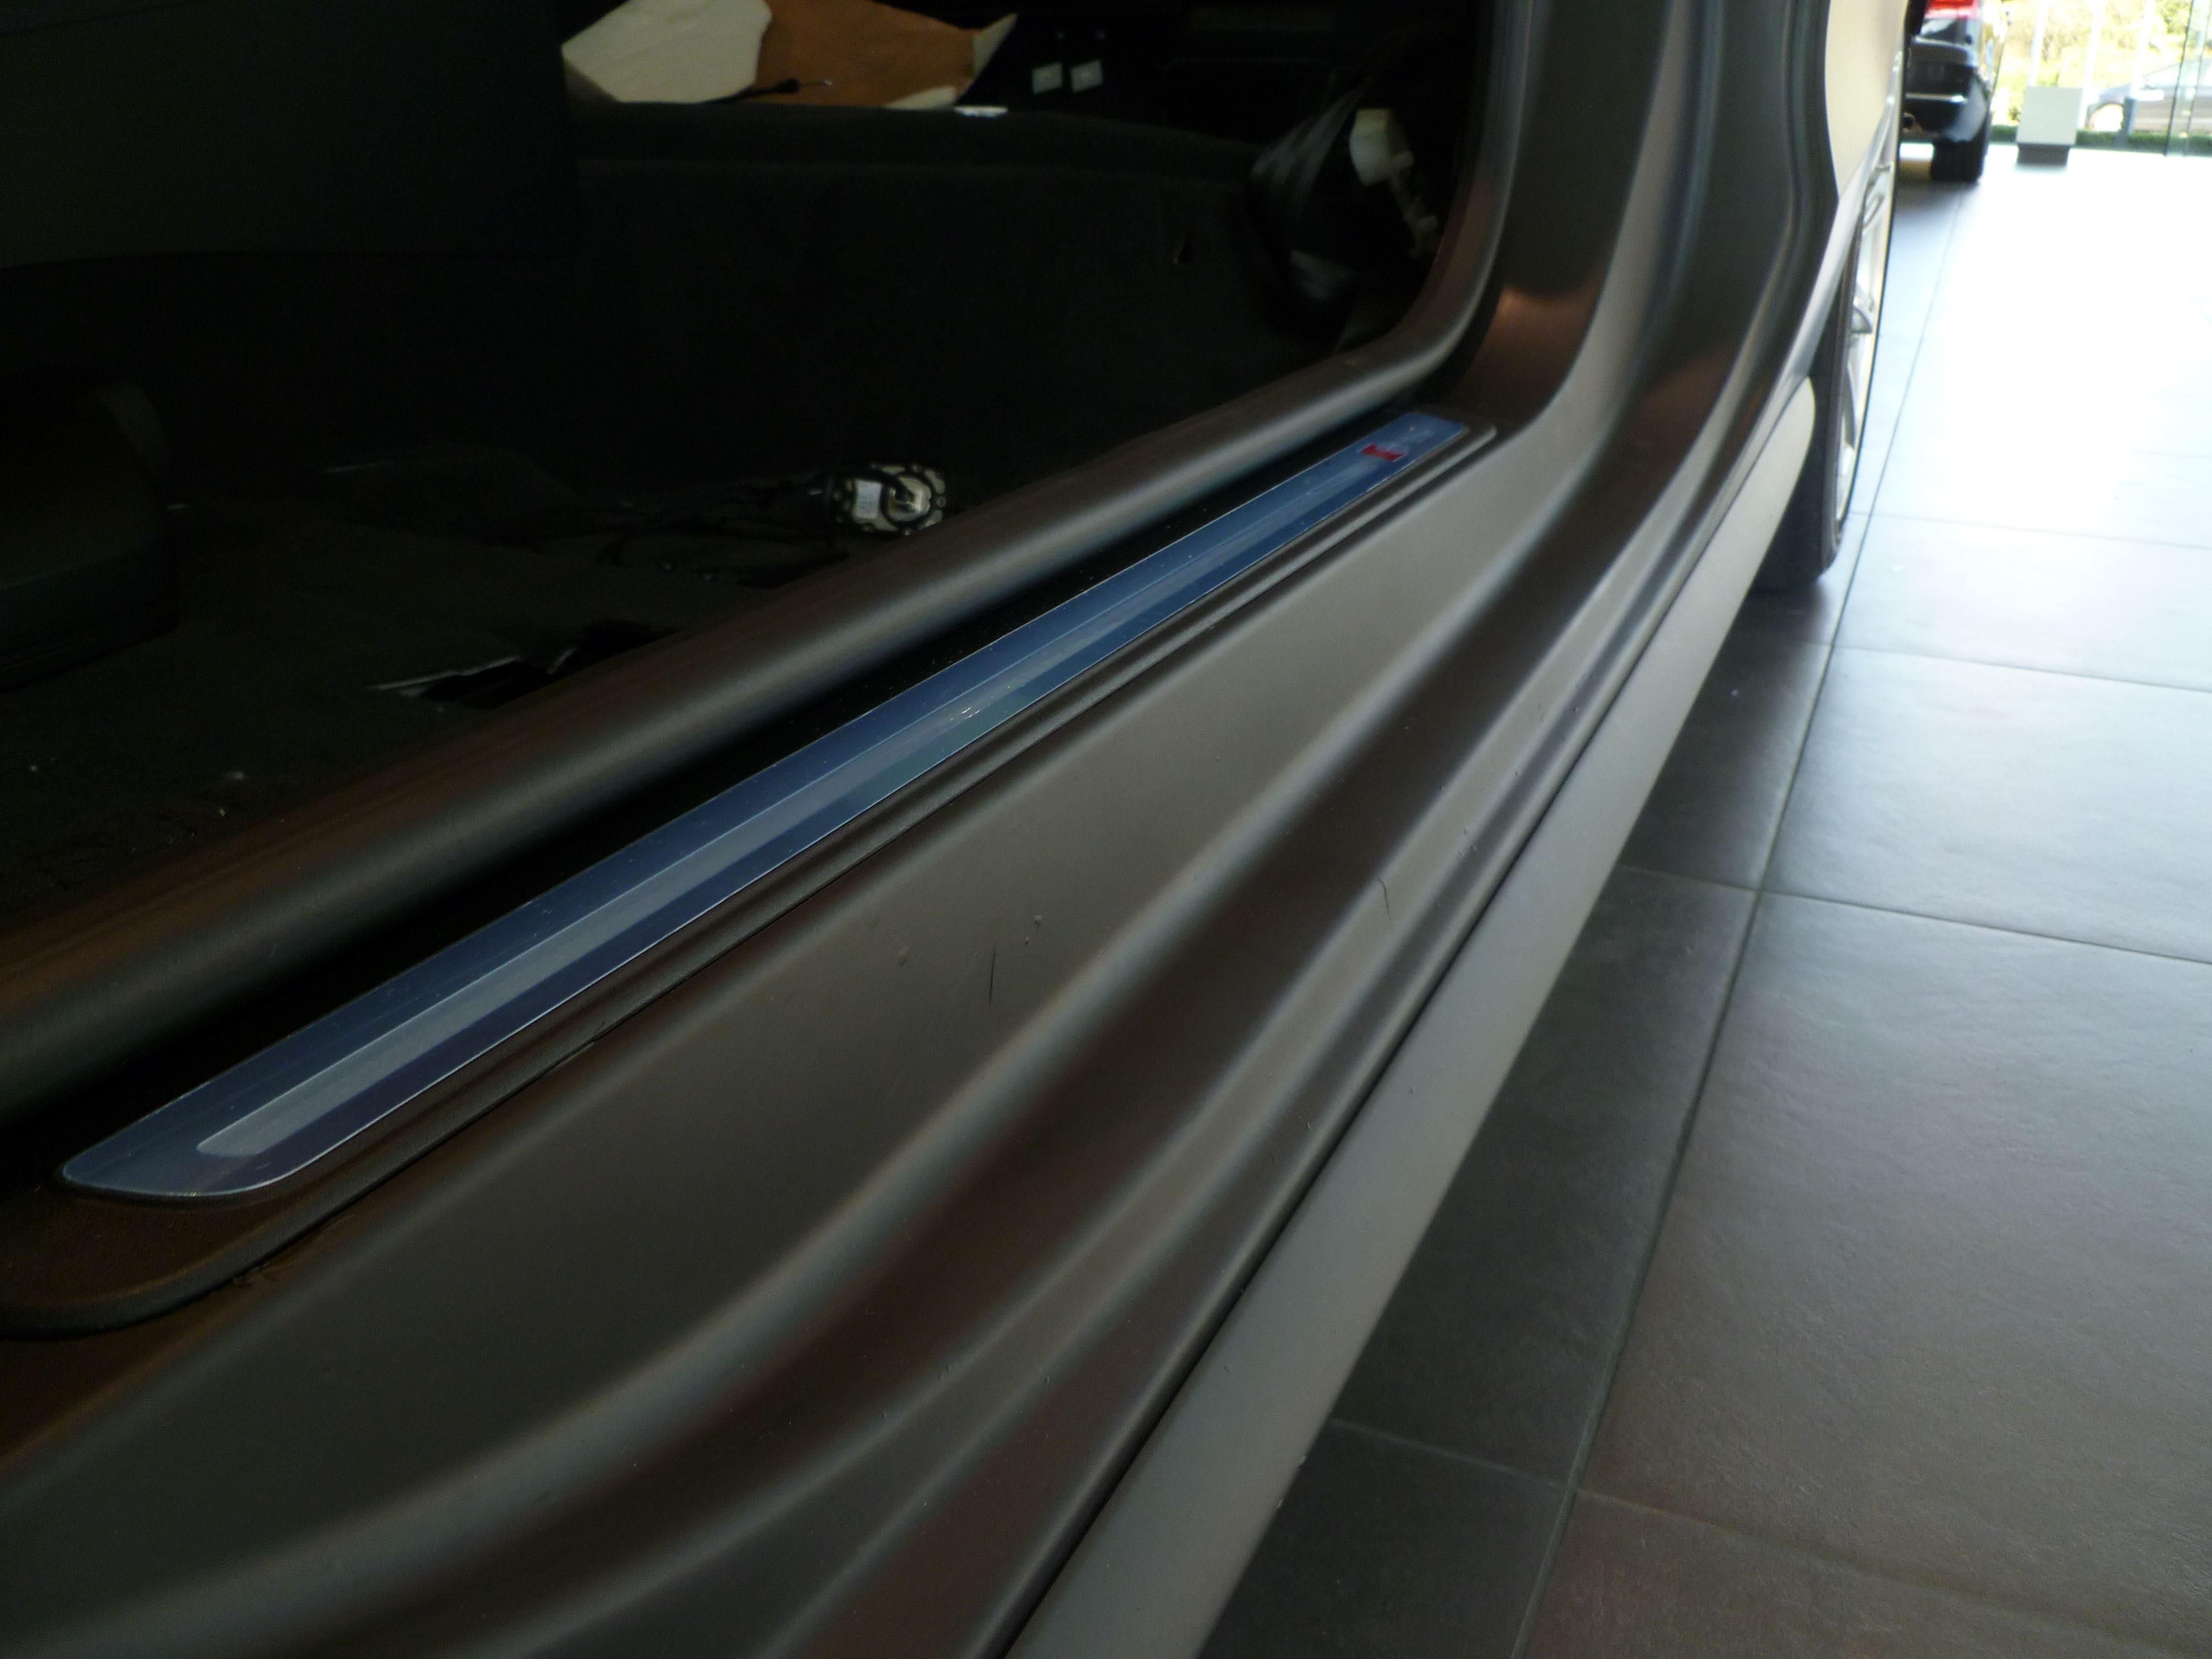 Audi A5 Coupe met Mat Zwarte Wrap, Carwrapping door Wrapmyride.nu Foto-nr:4644, ©2021